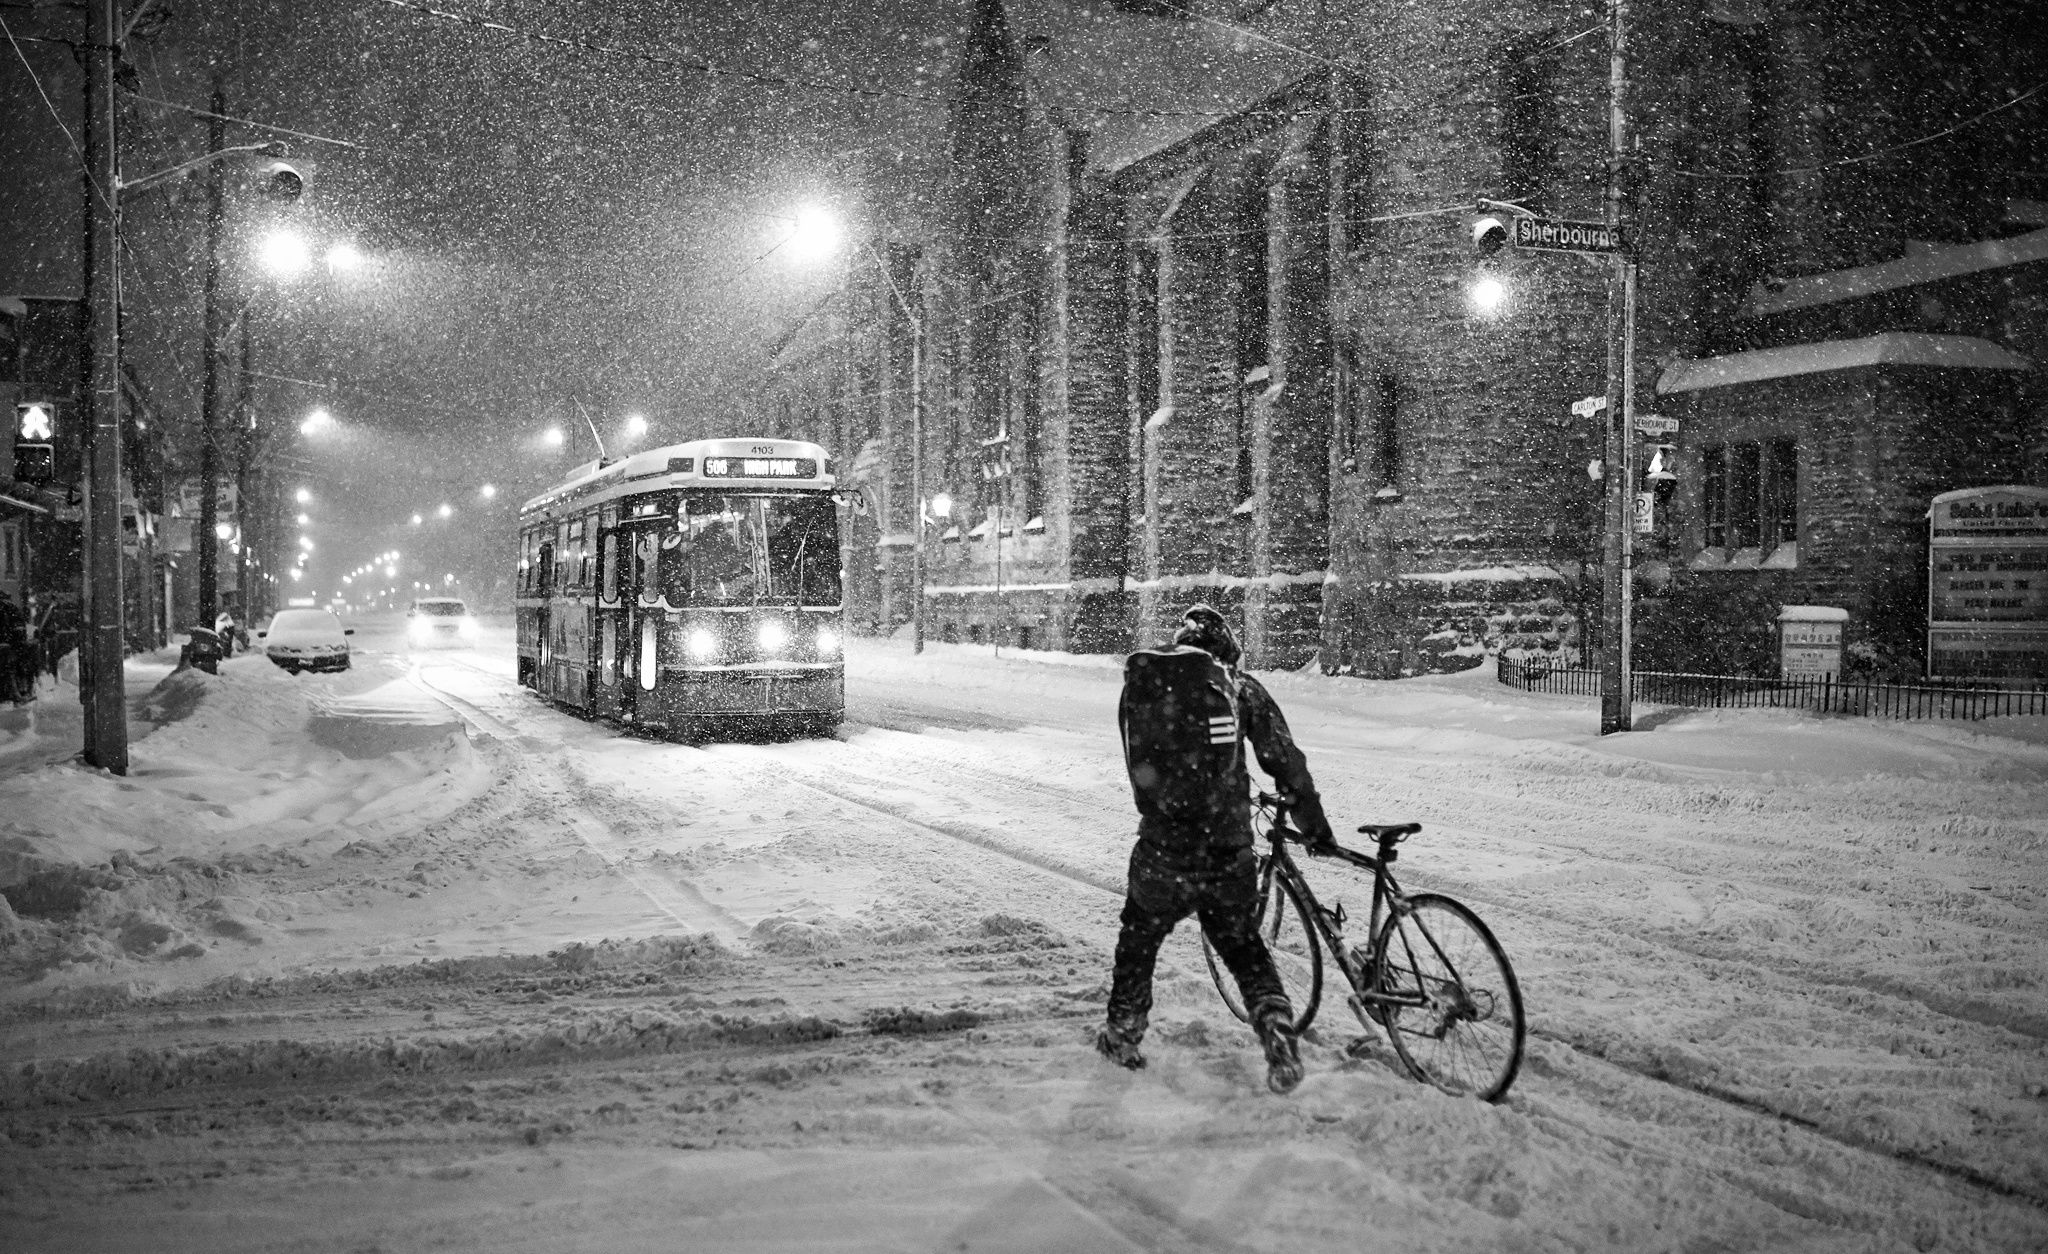 snowy-night_bike_streetcar_sherbourne-carlton_01-01-01.jpeg